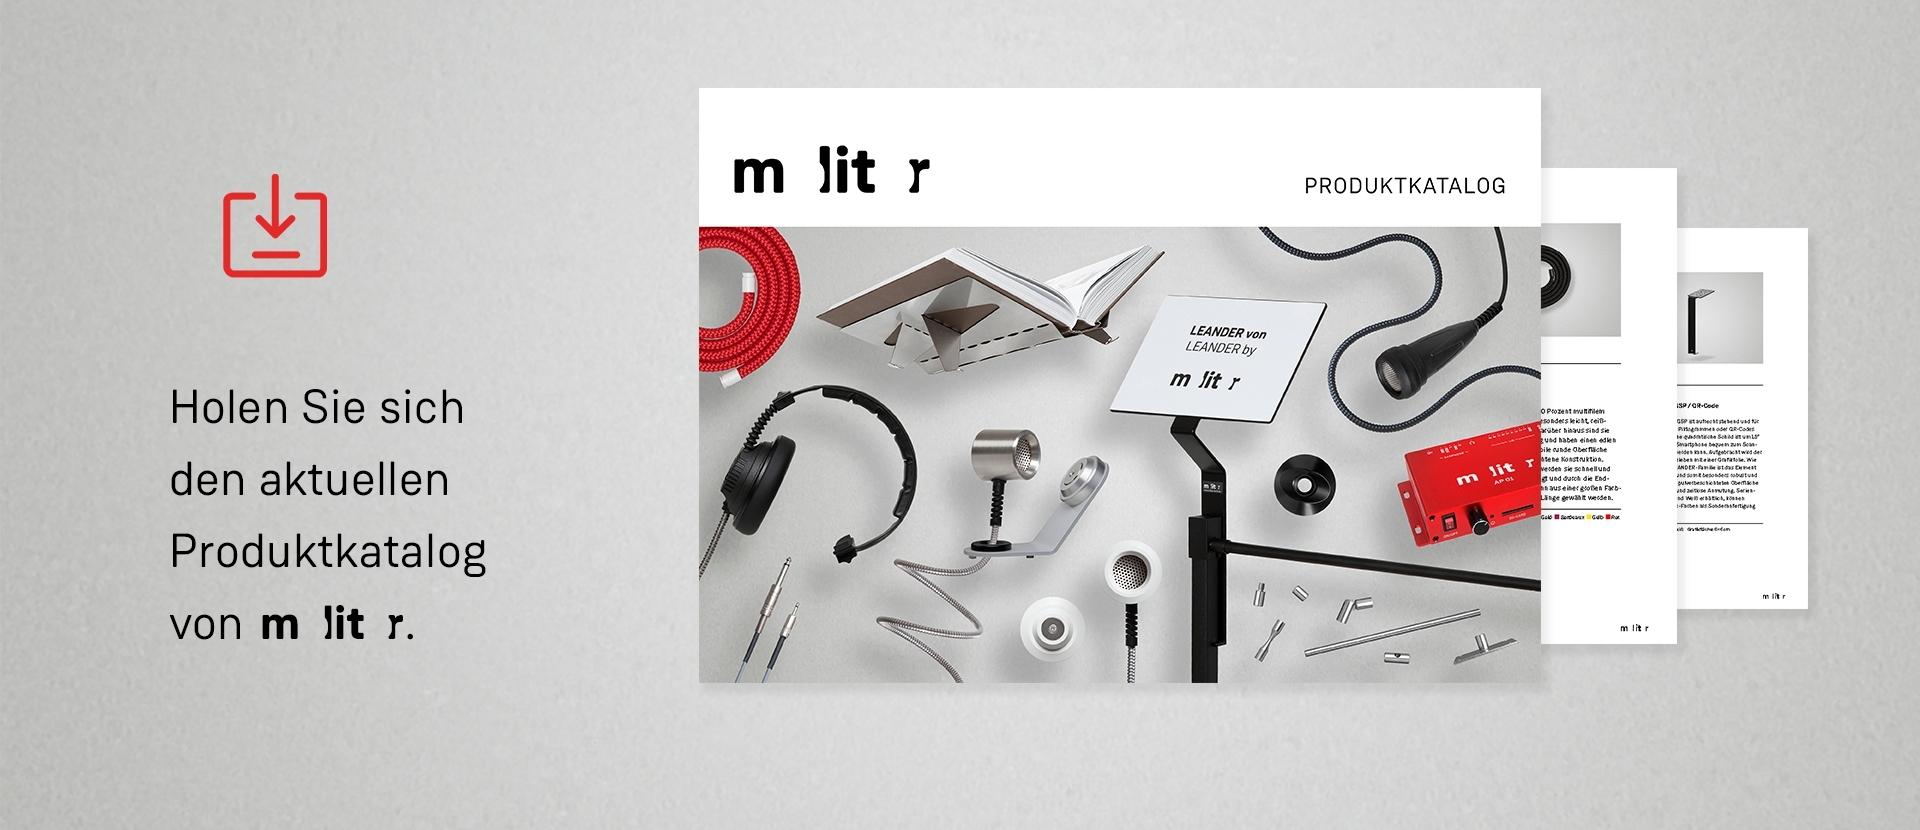 Produktkatalog von molitor GmbH